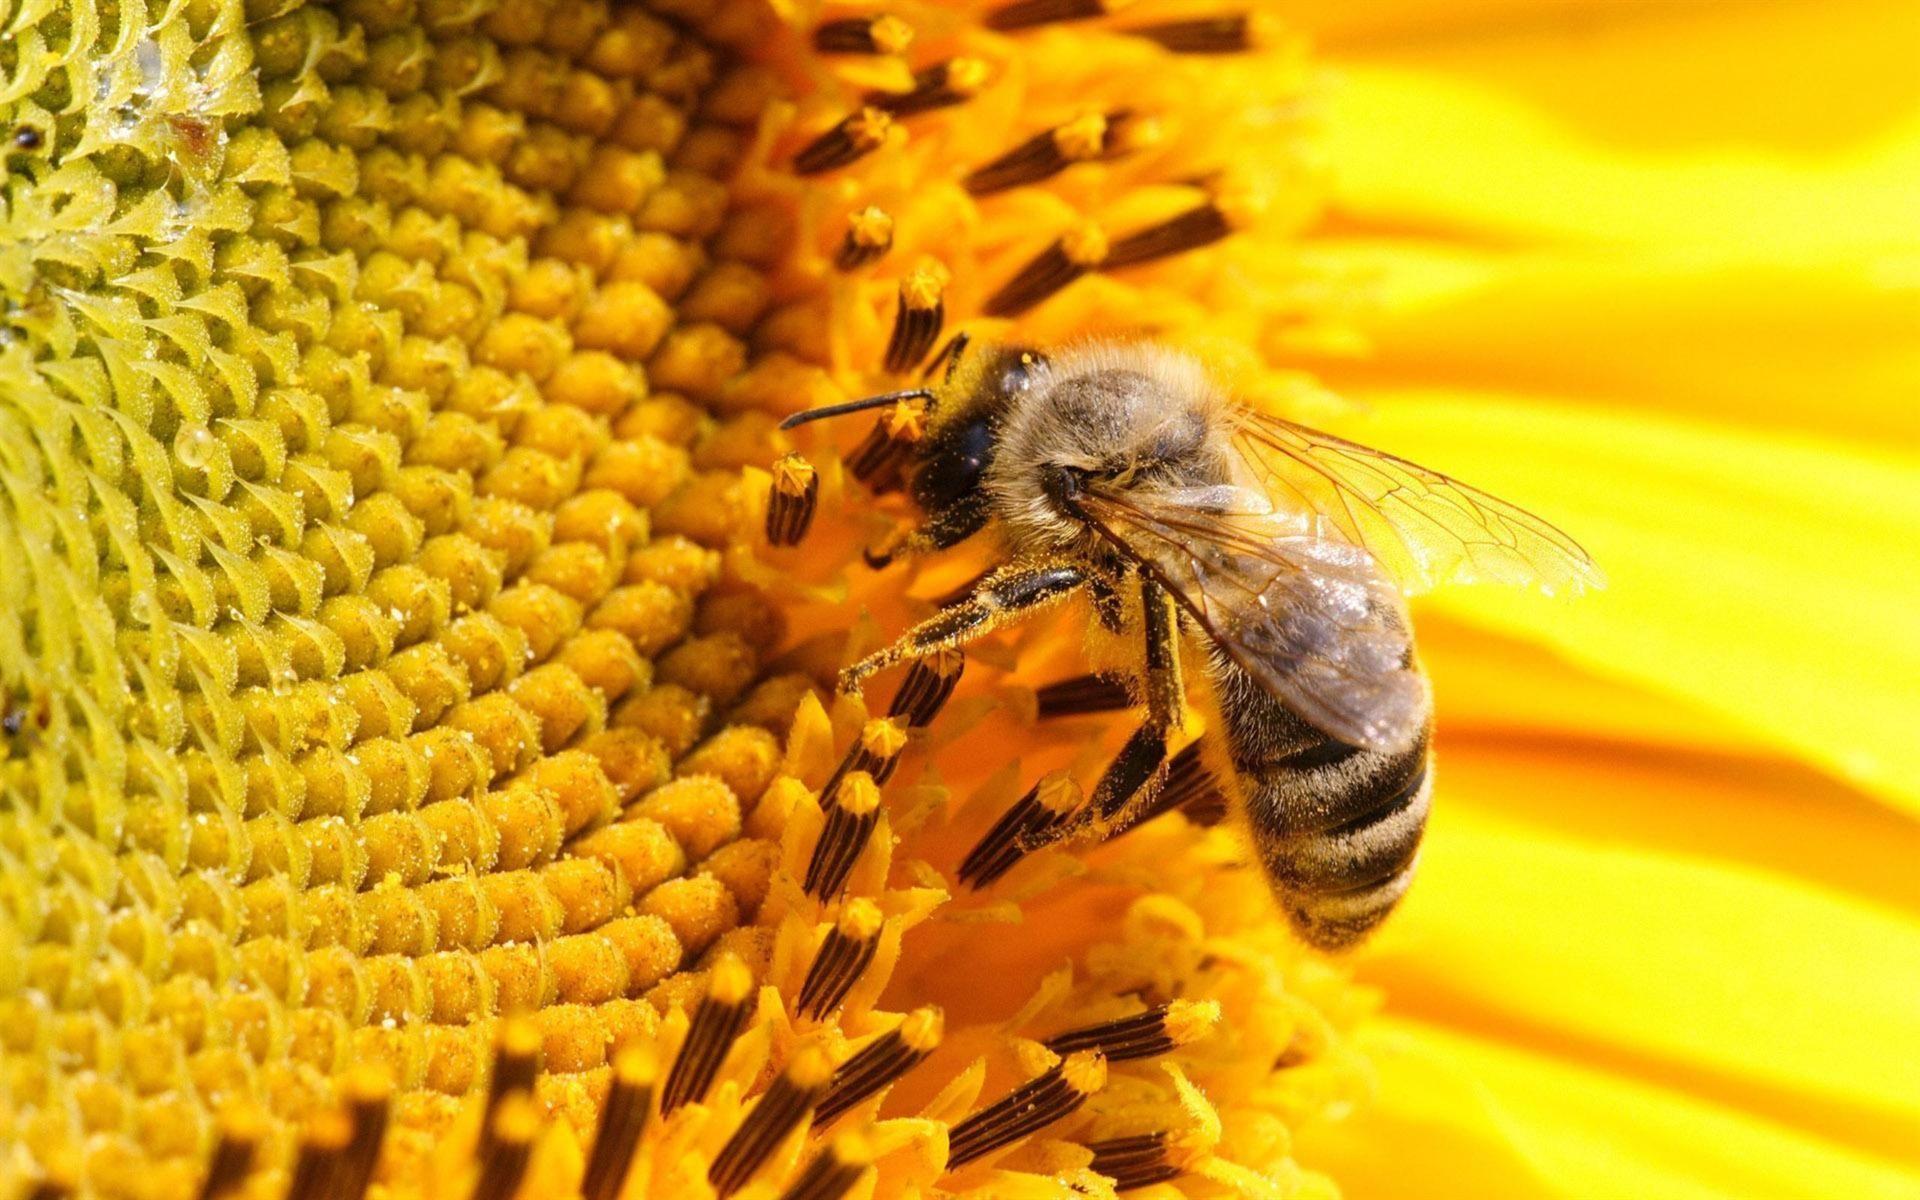 honey bee on flower Google Search Bee on flower, Bee